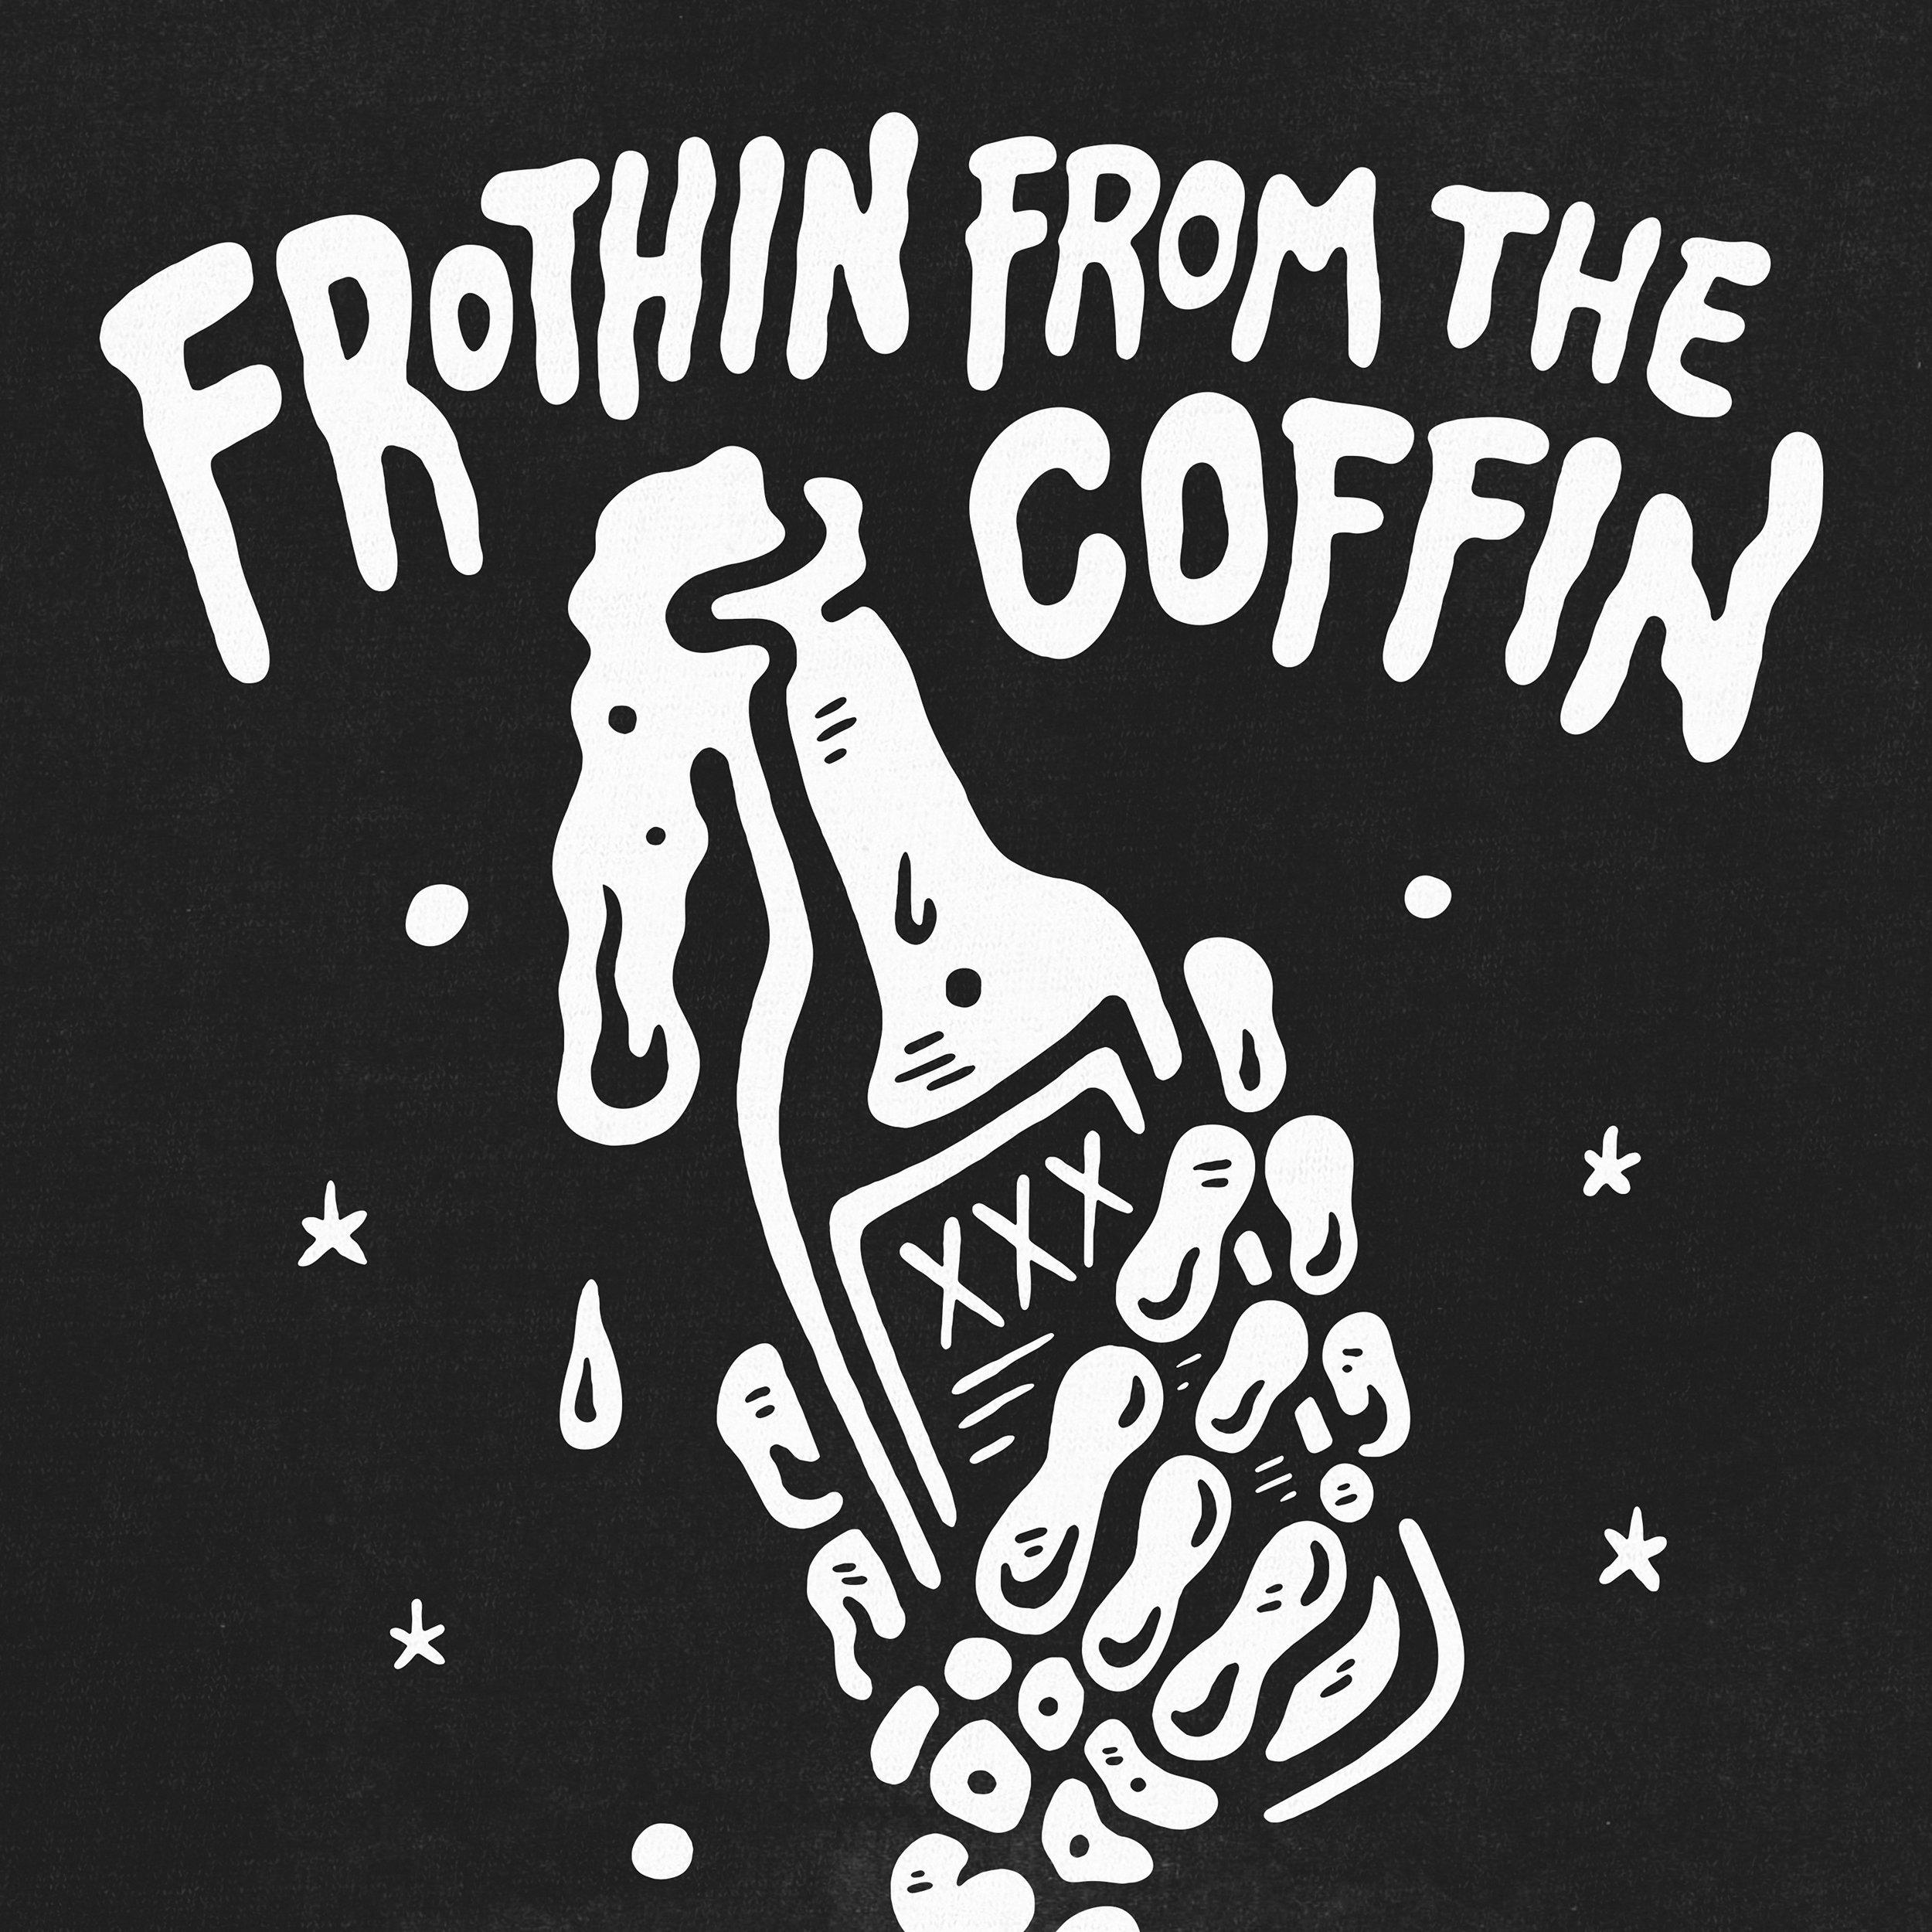 FROTHIN [INSTA WORKING].jpg